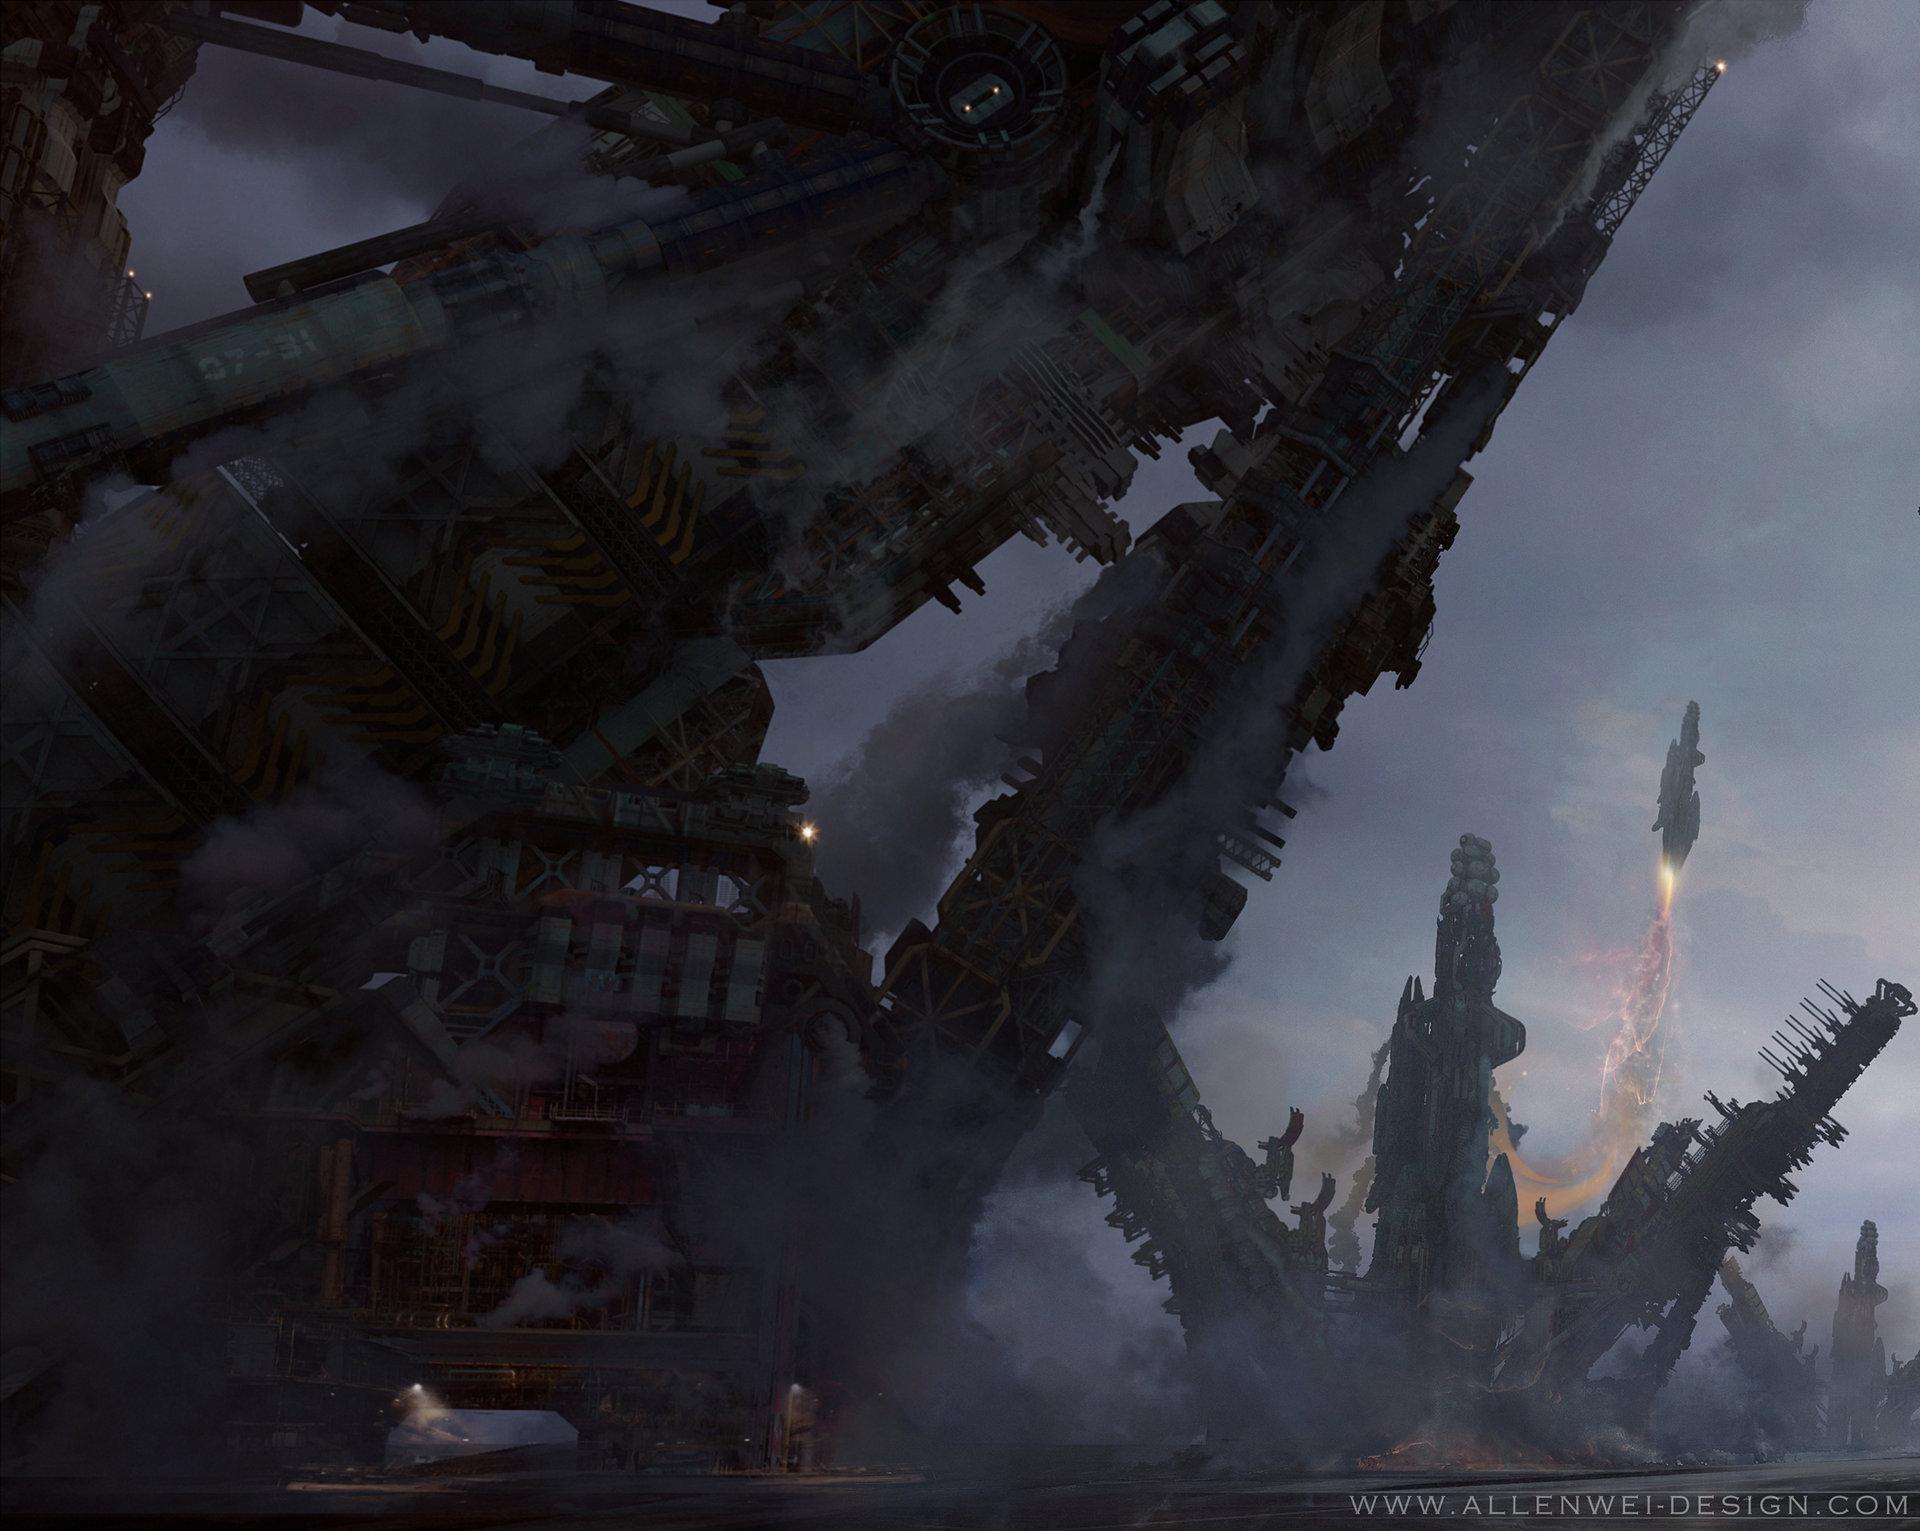 Allen wei env main ship lanch details 03